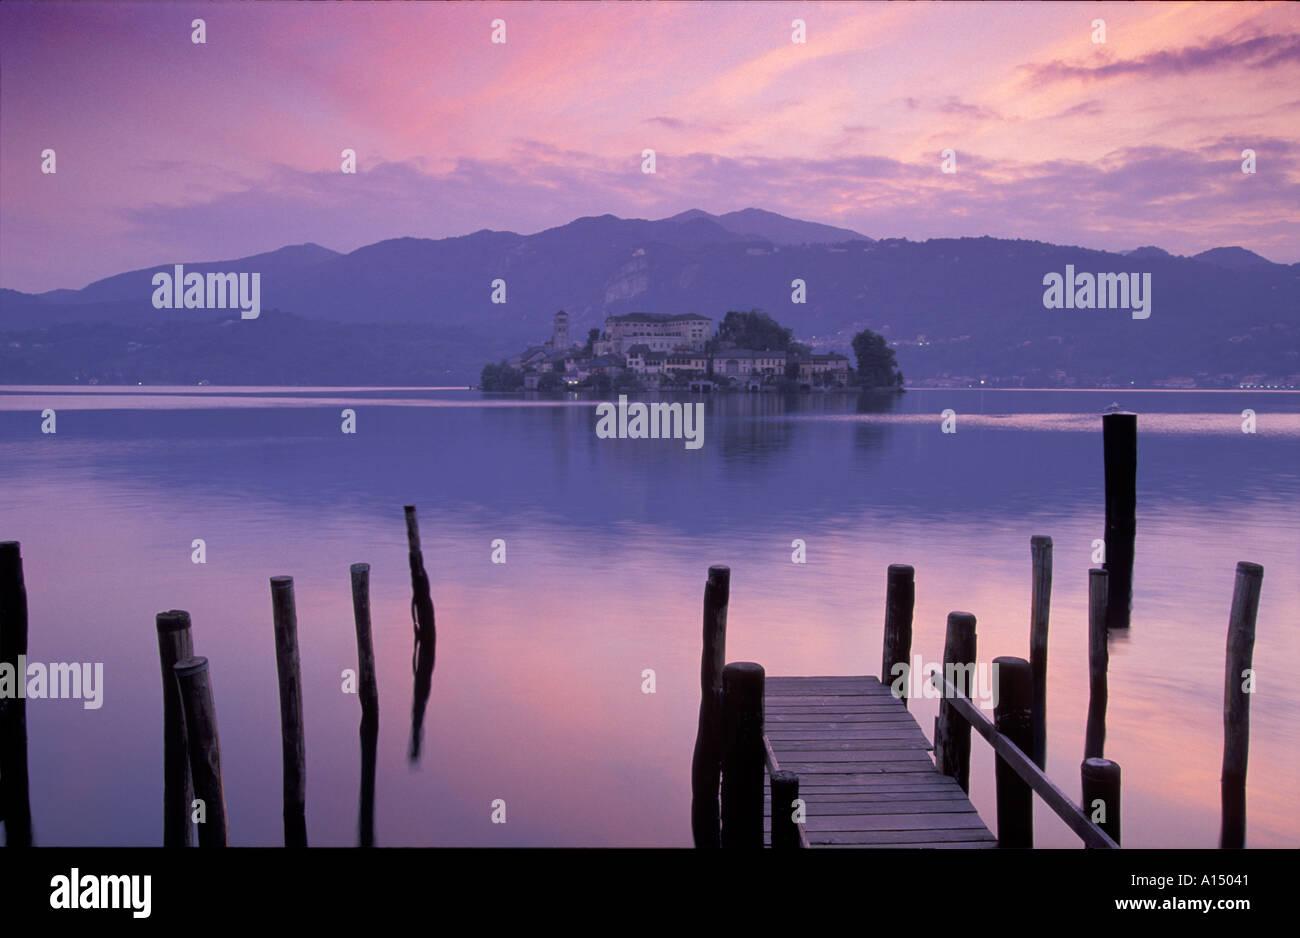 Lake Orta Picardy Italy Stock Photo